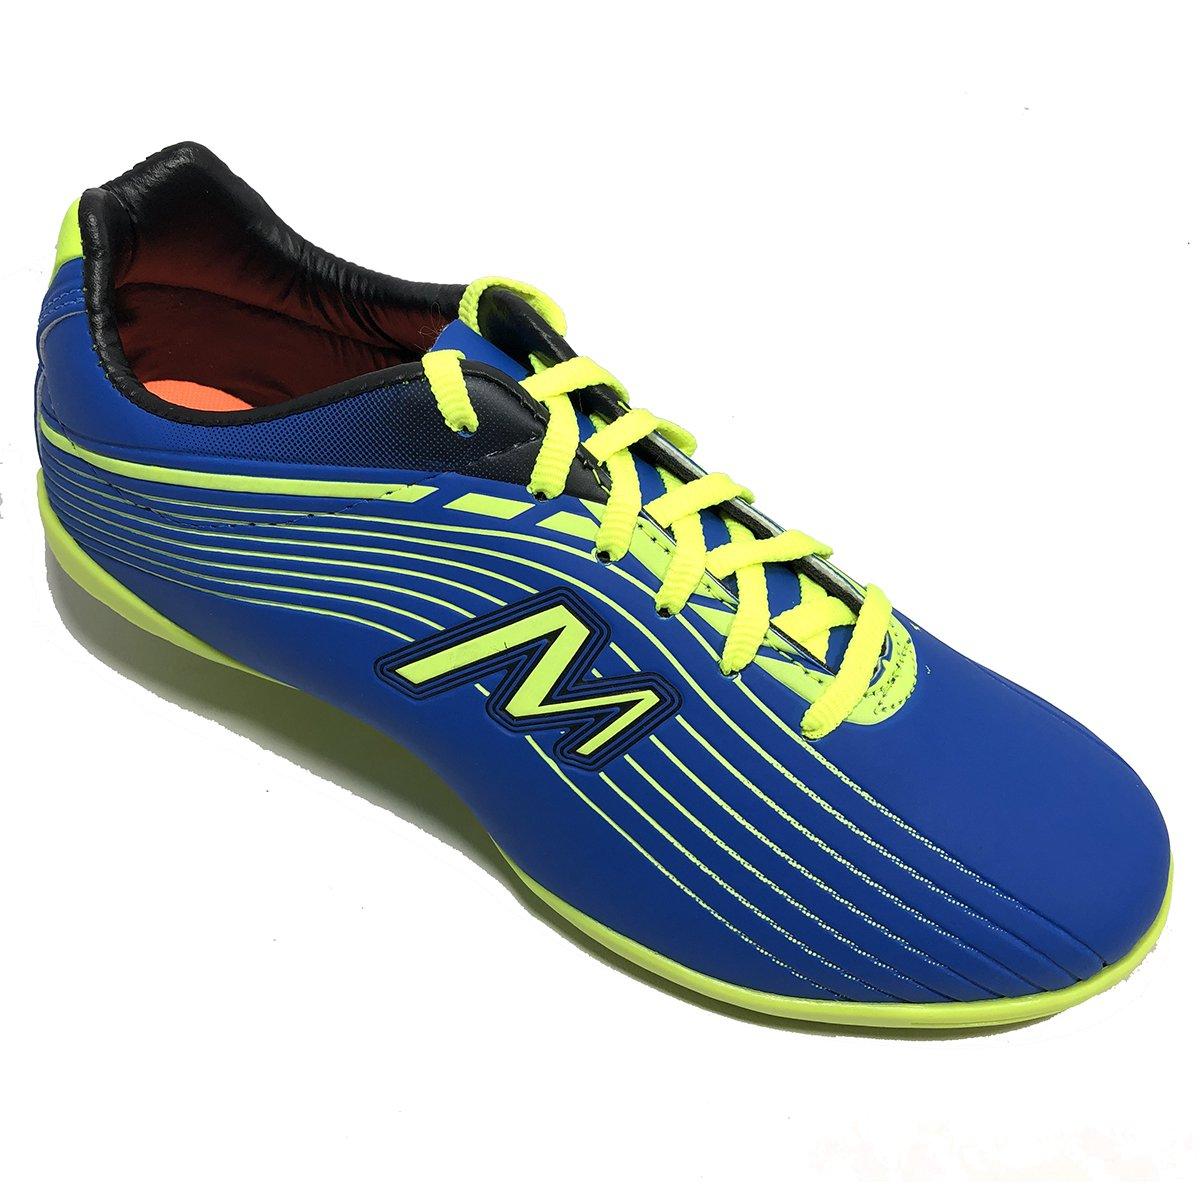 Chuteira Futsal Mathaus Neon Masculina - Azul e Verde Limão